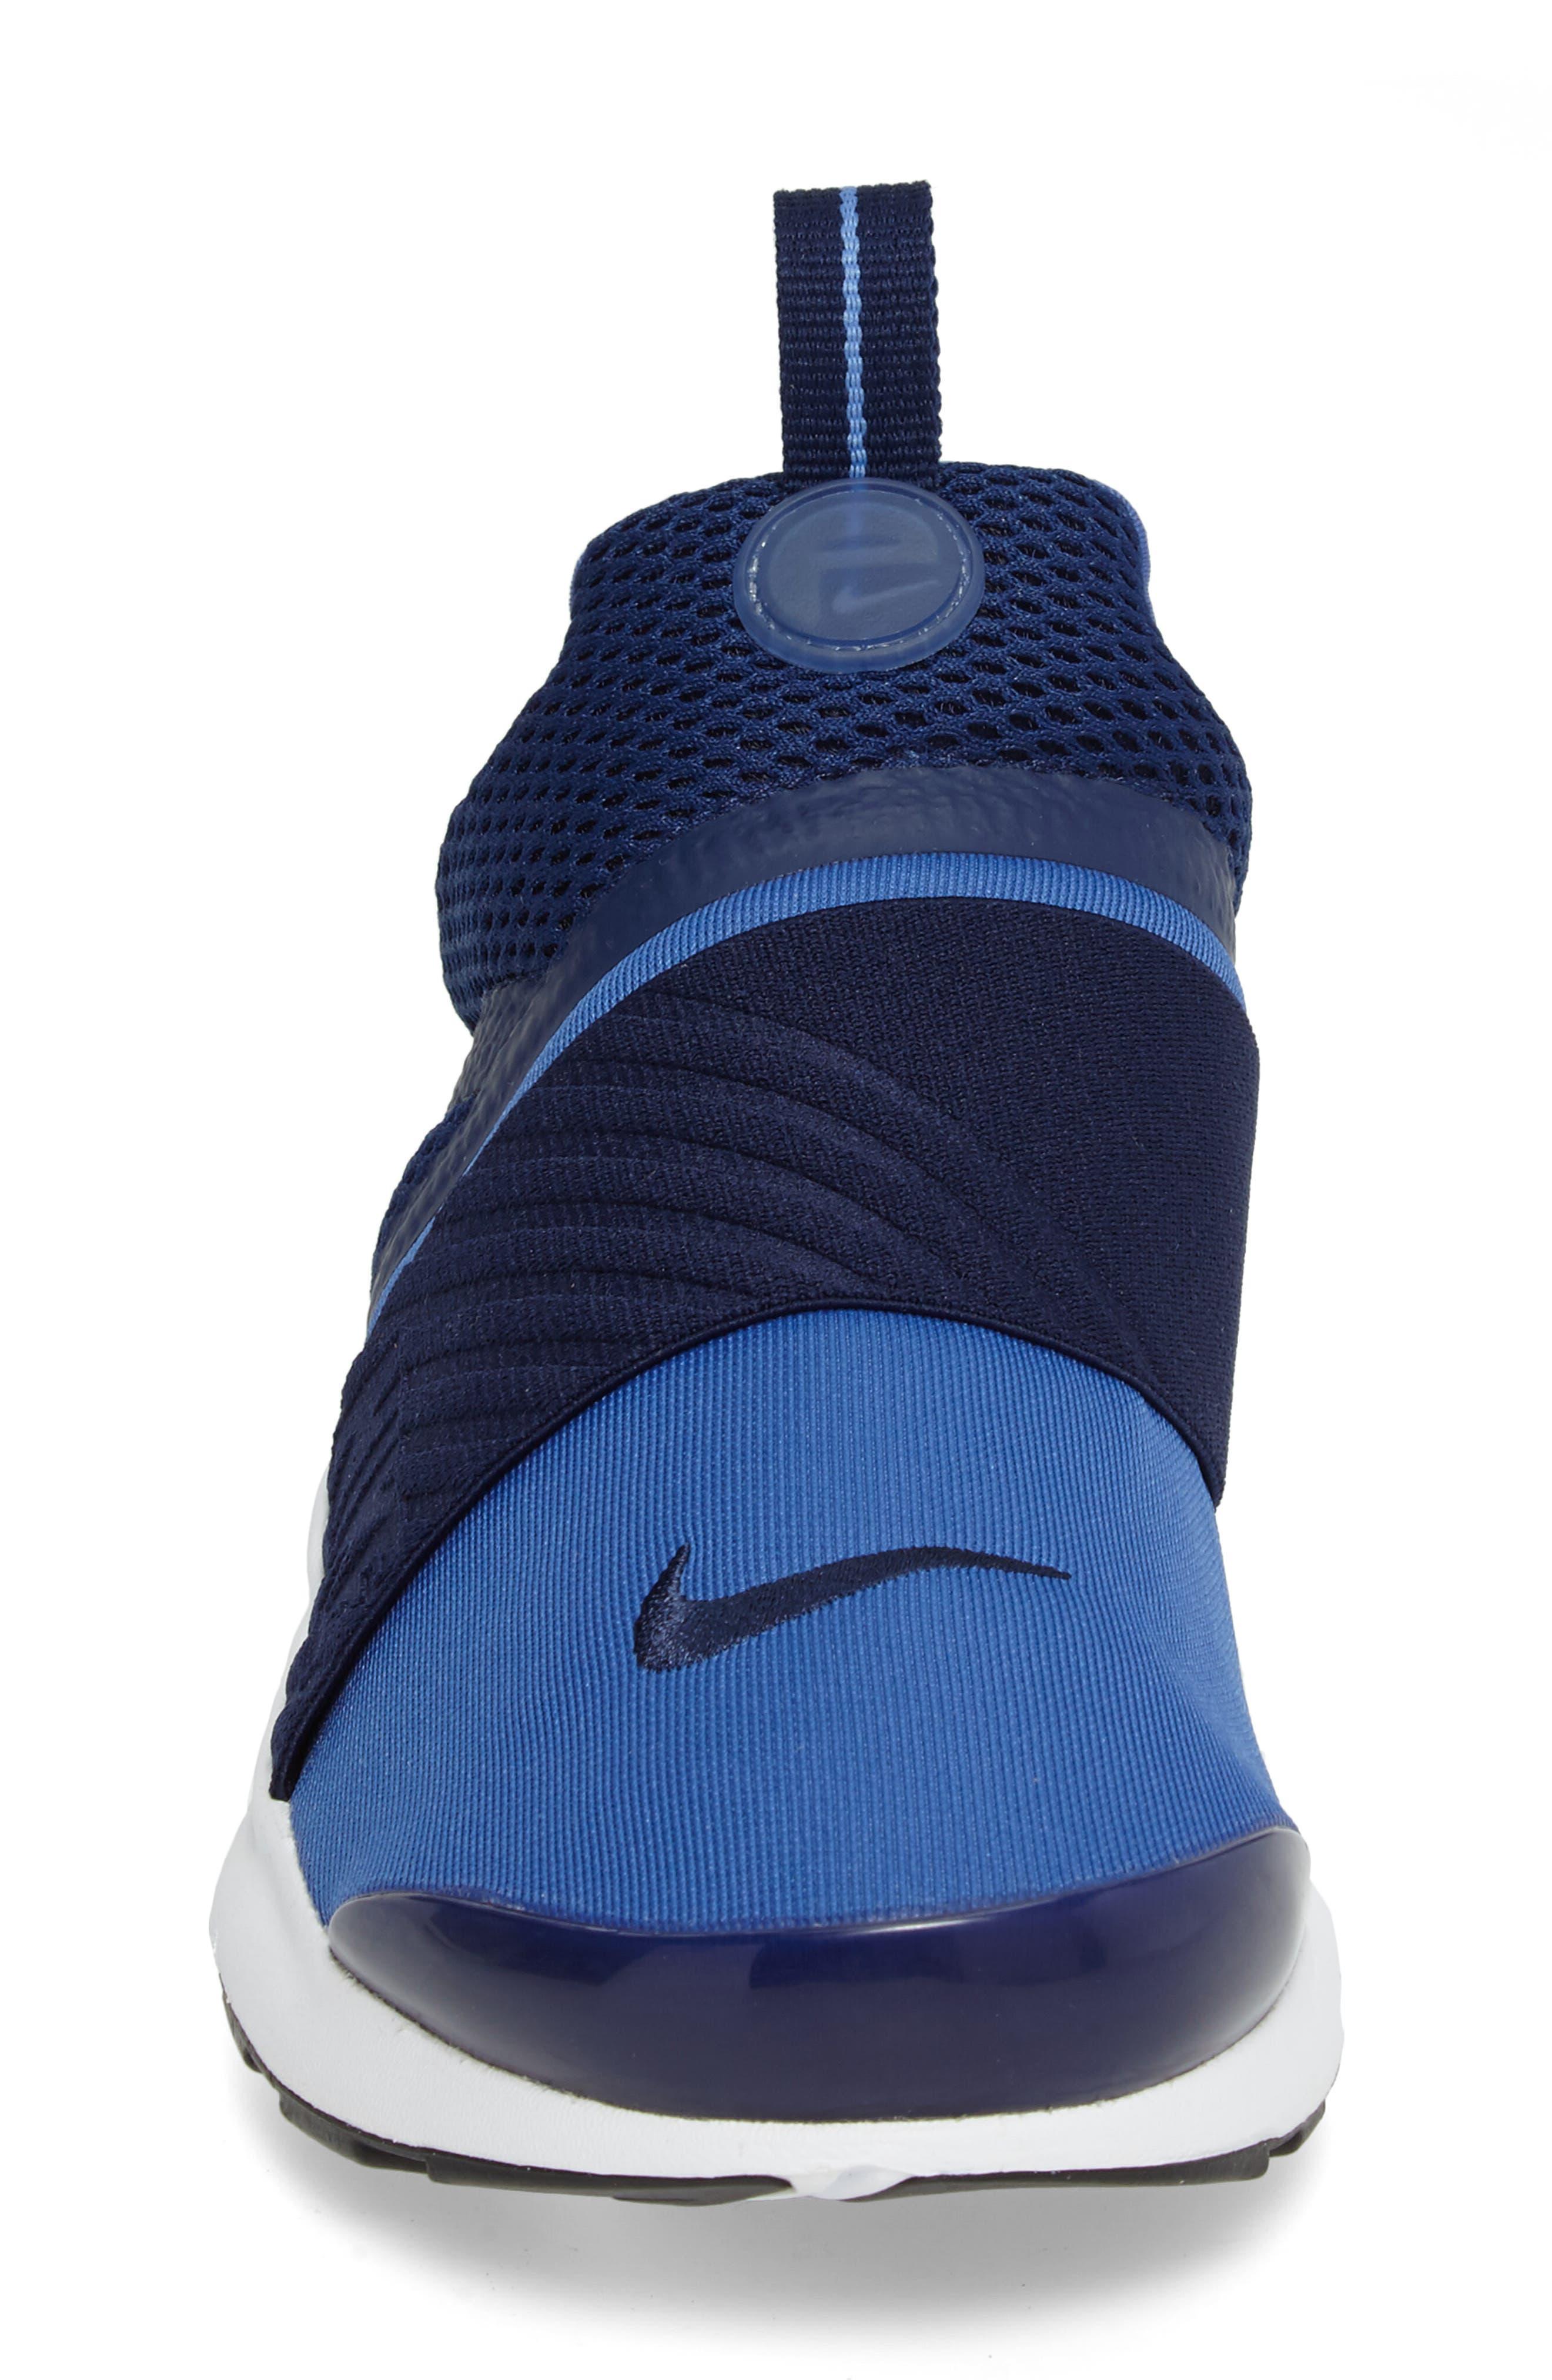 Presto Extreme Sneaker,                             Alternate thumbnail 41, color,